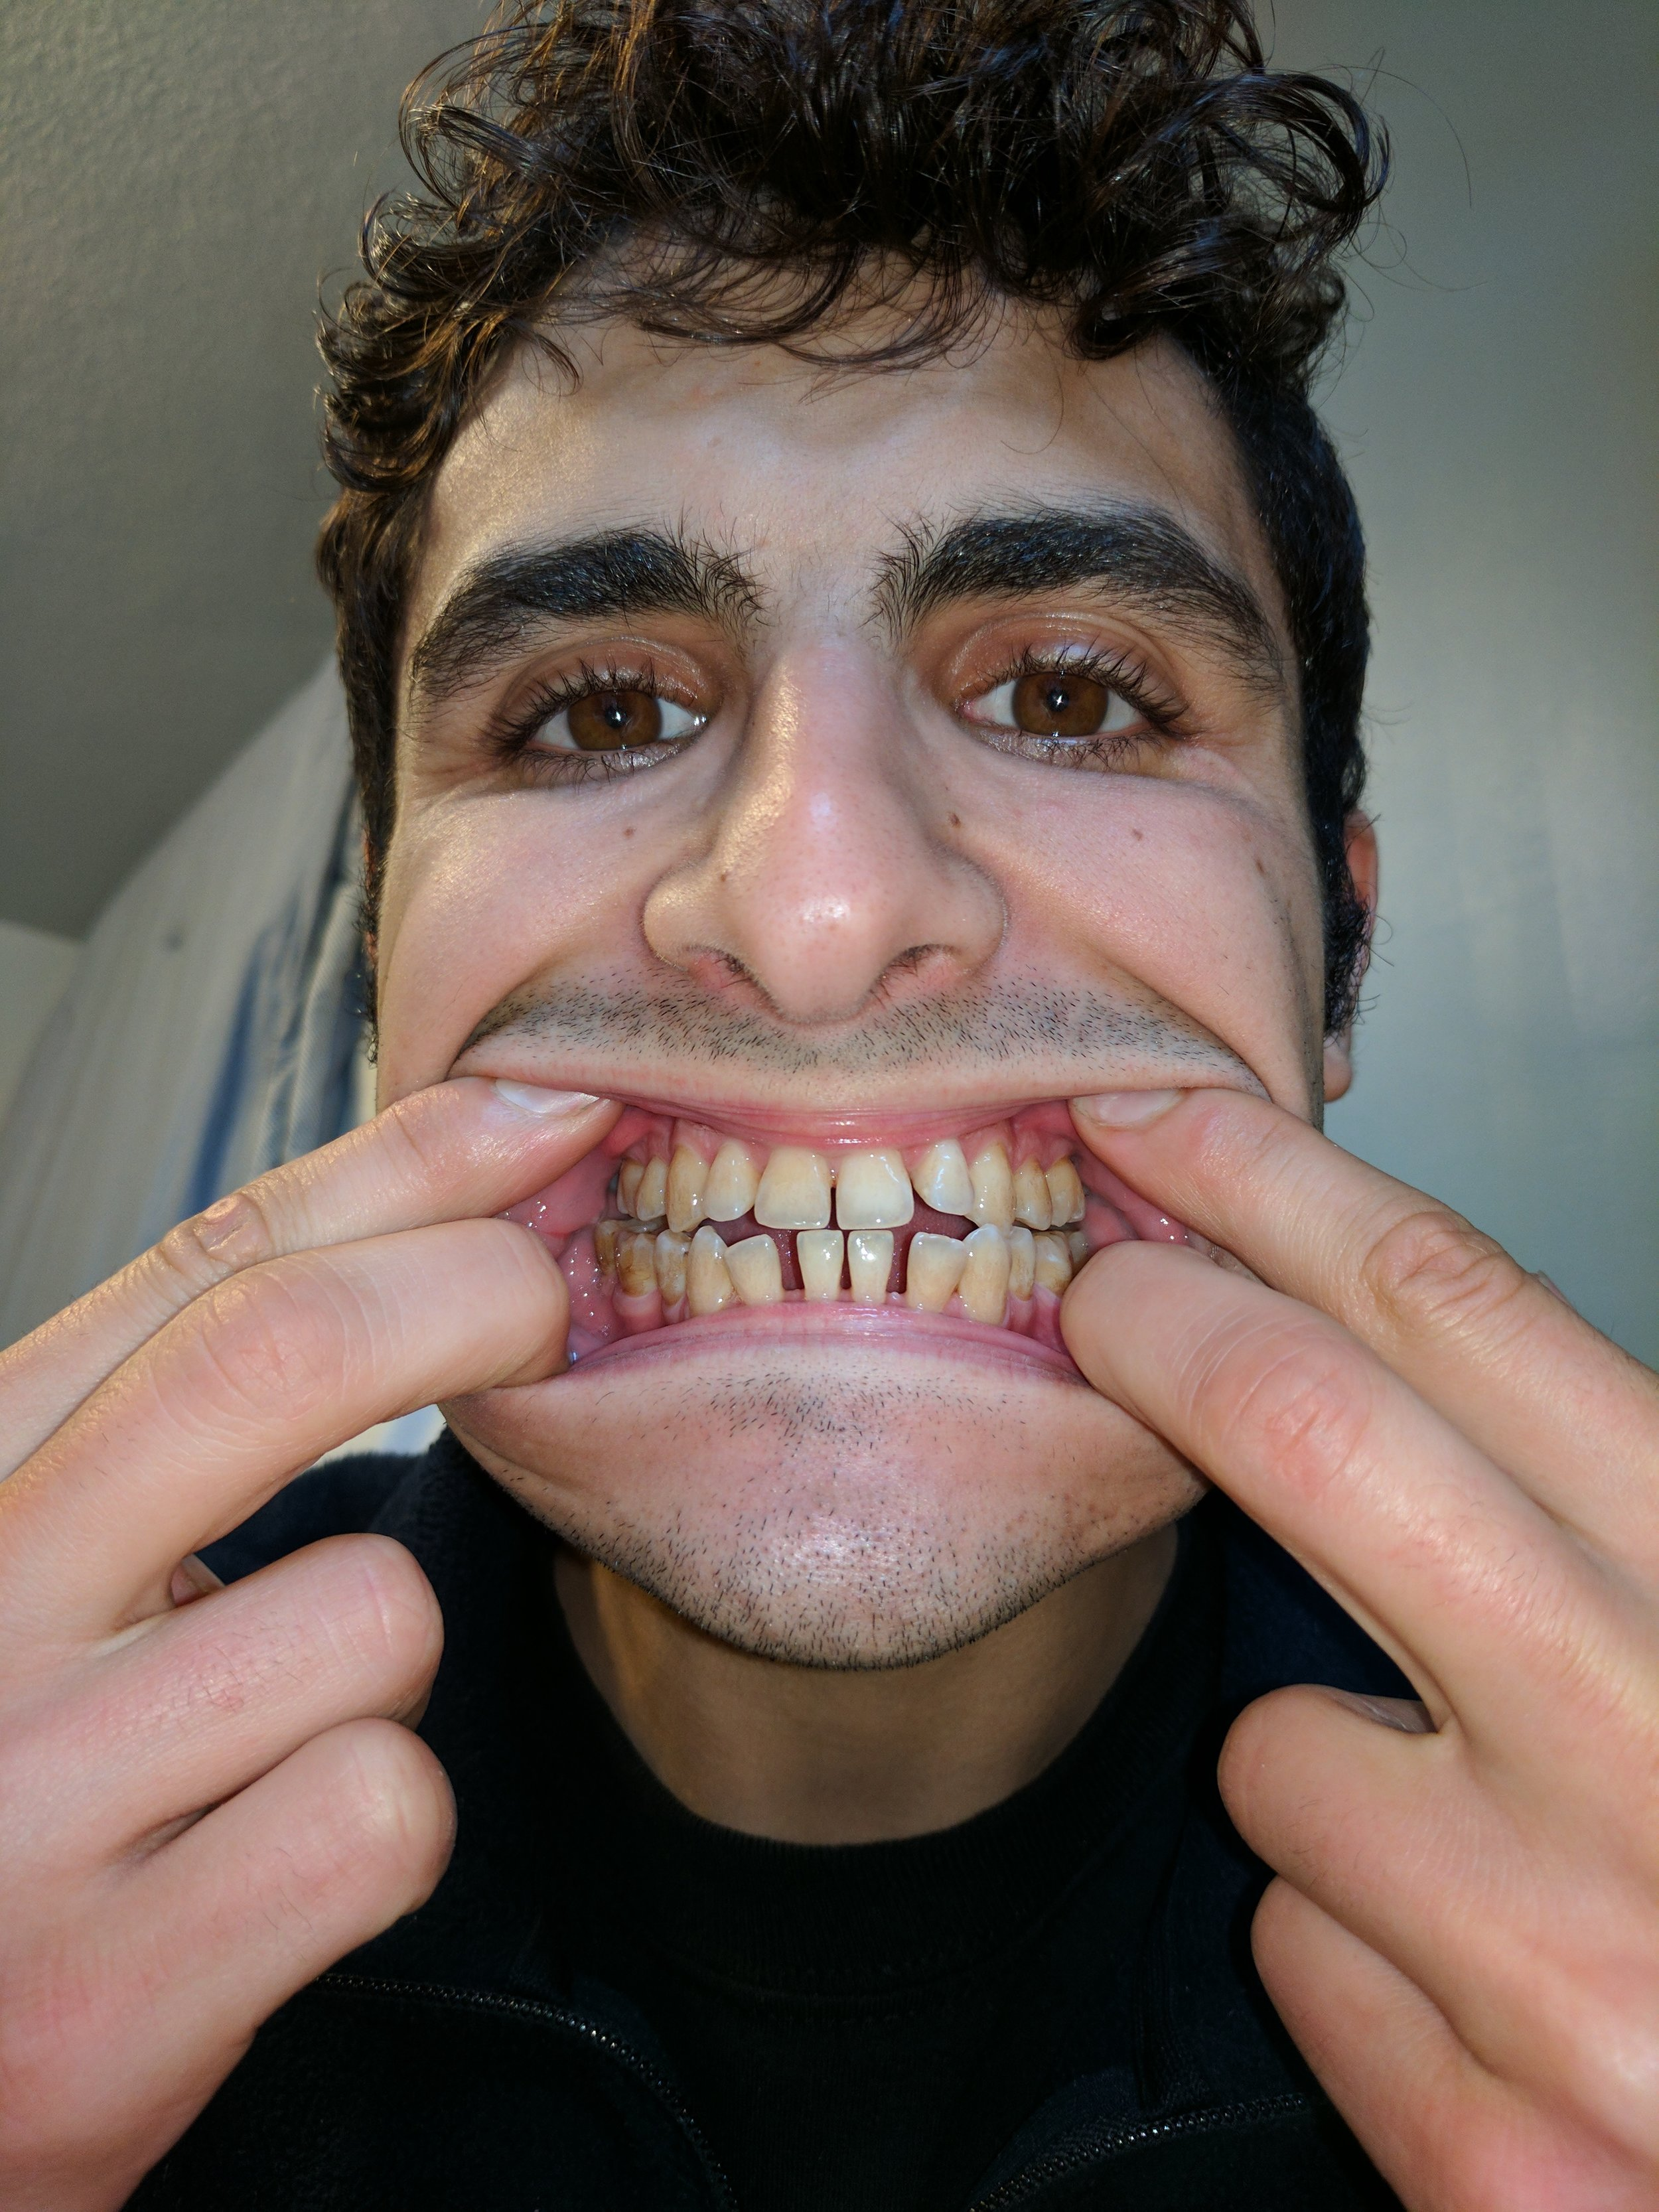 Front teeth flaring in sockets.